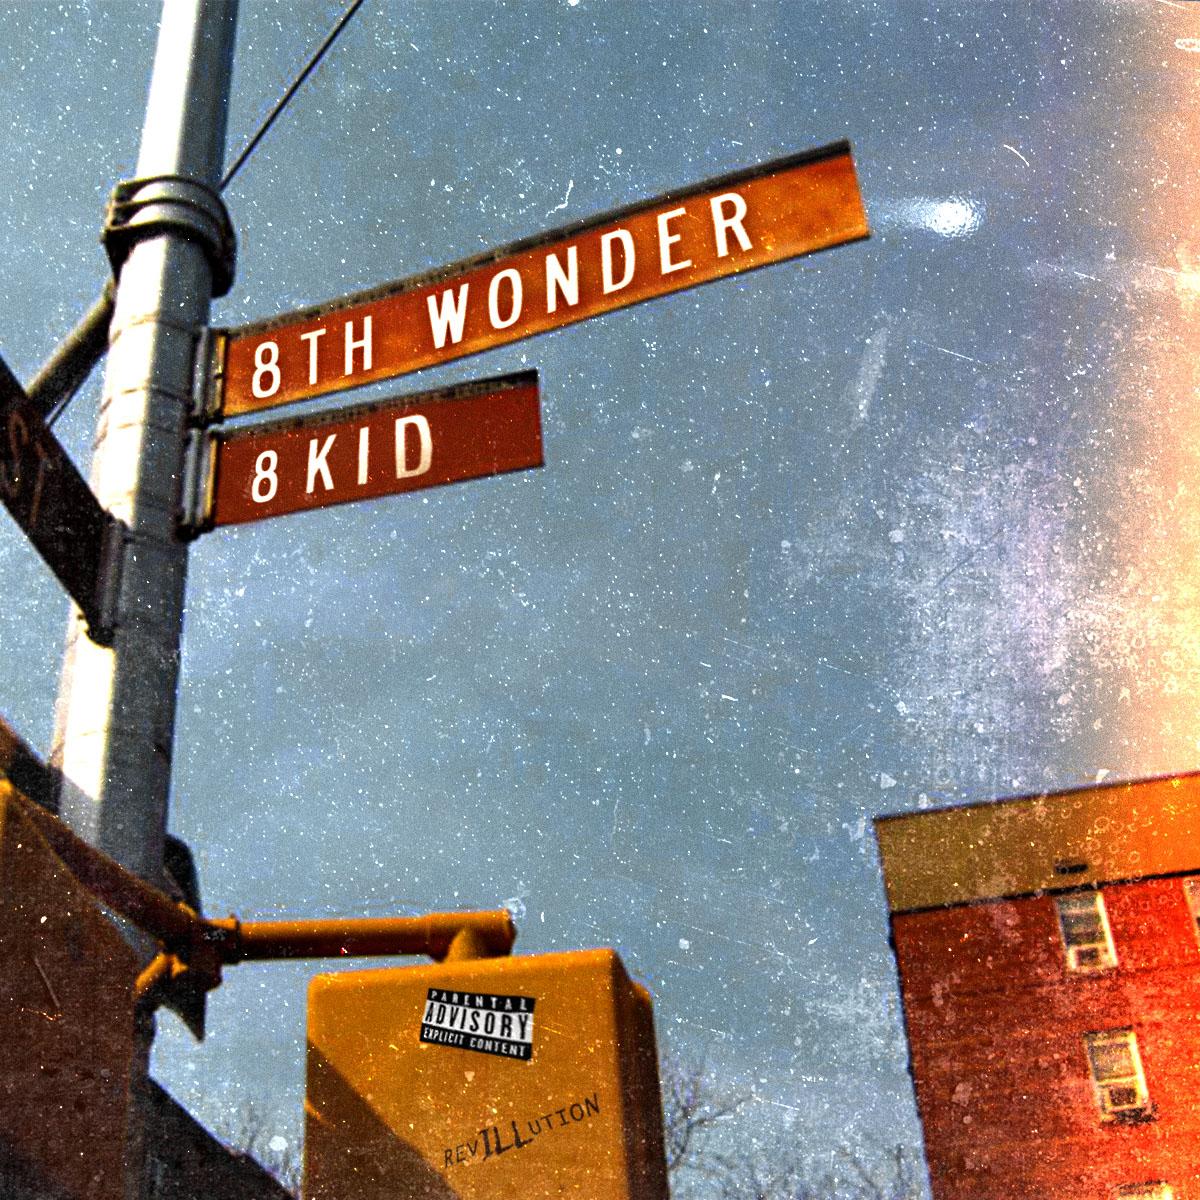 8KID - 8TH WONDER